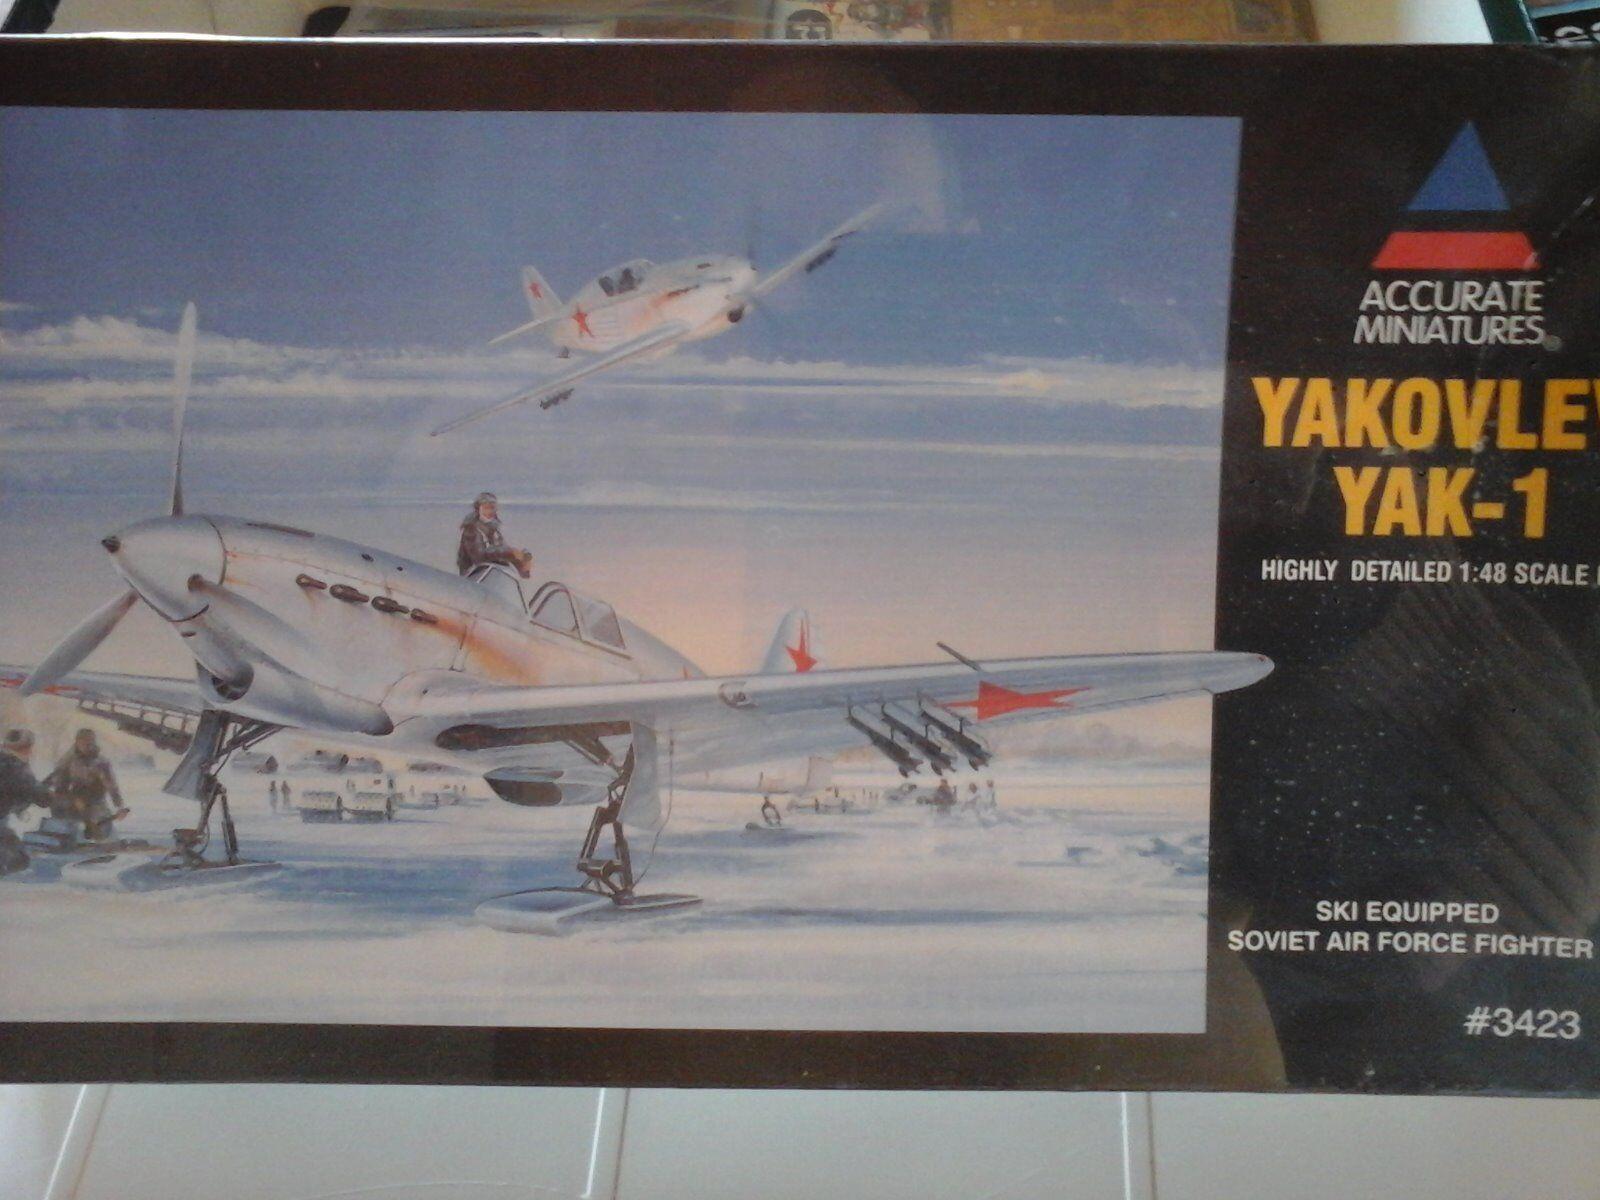 YAKOLEV YAK1 FIGHTER 1 48 SCALE ACCURATE MINIATURES MODEL